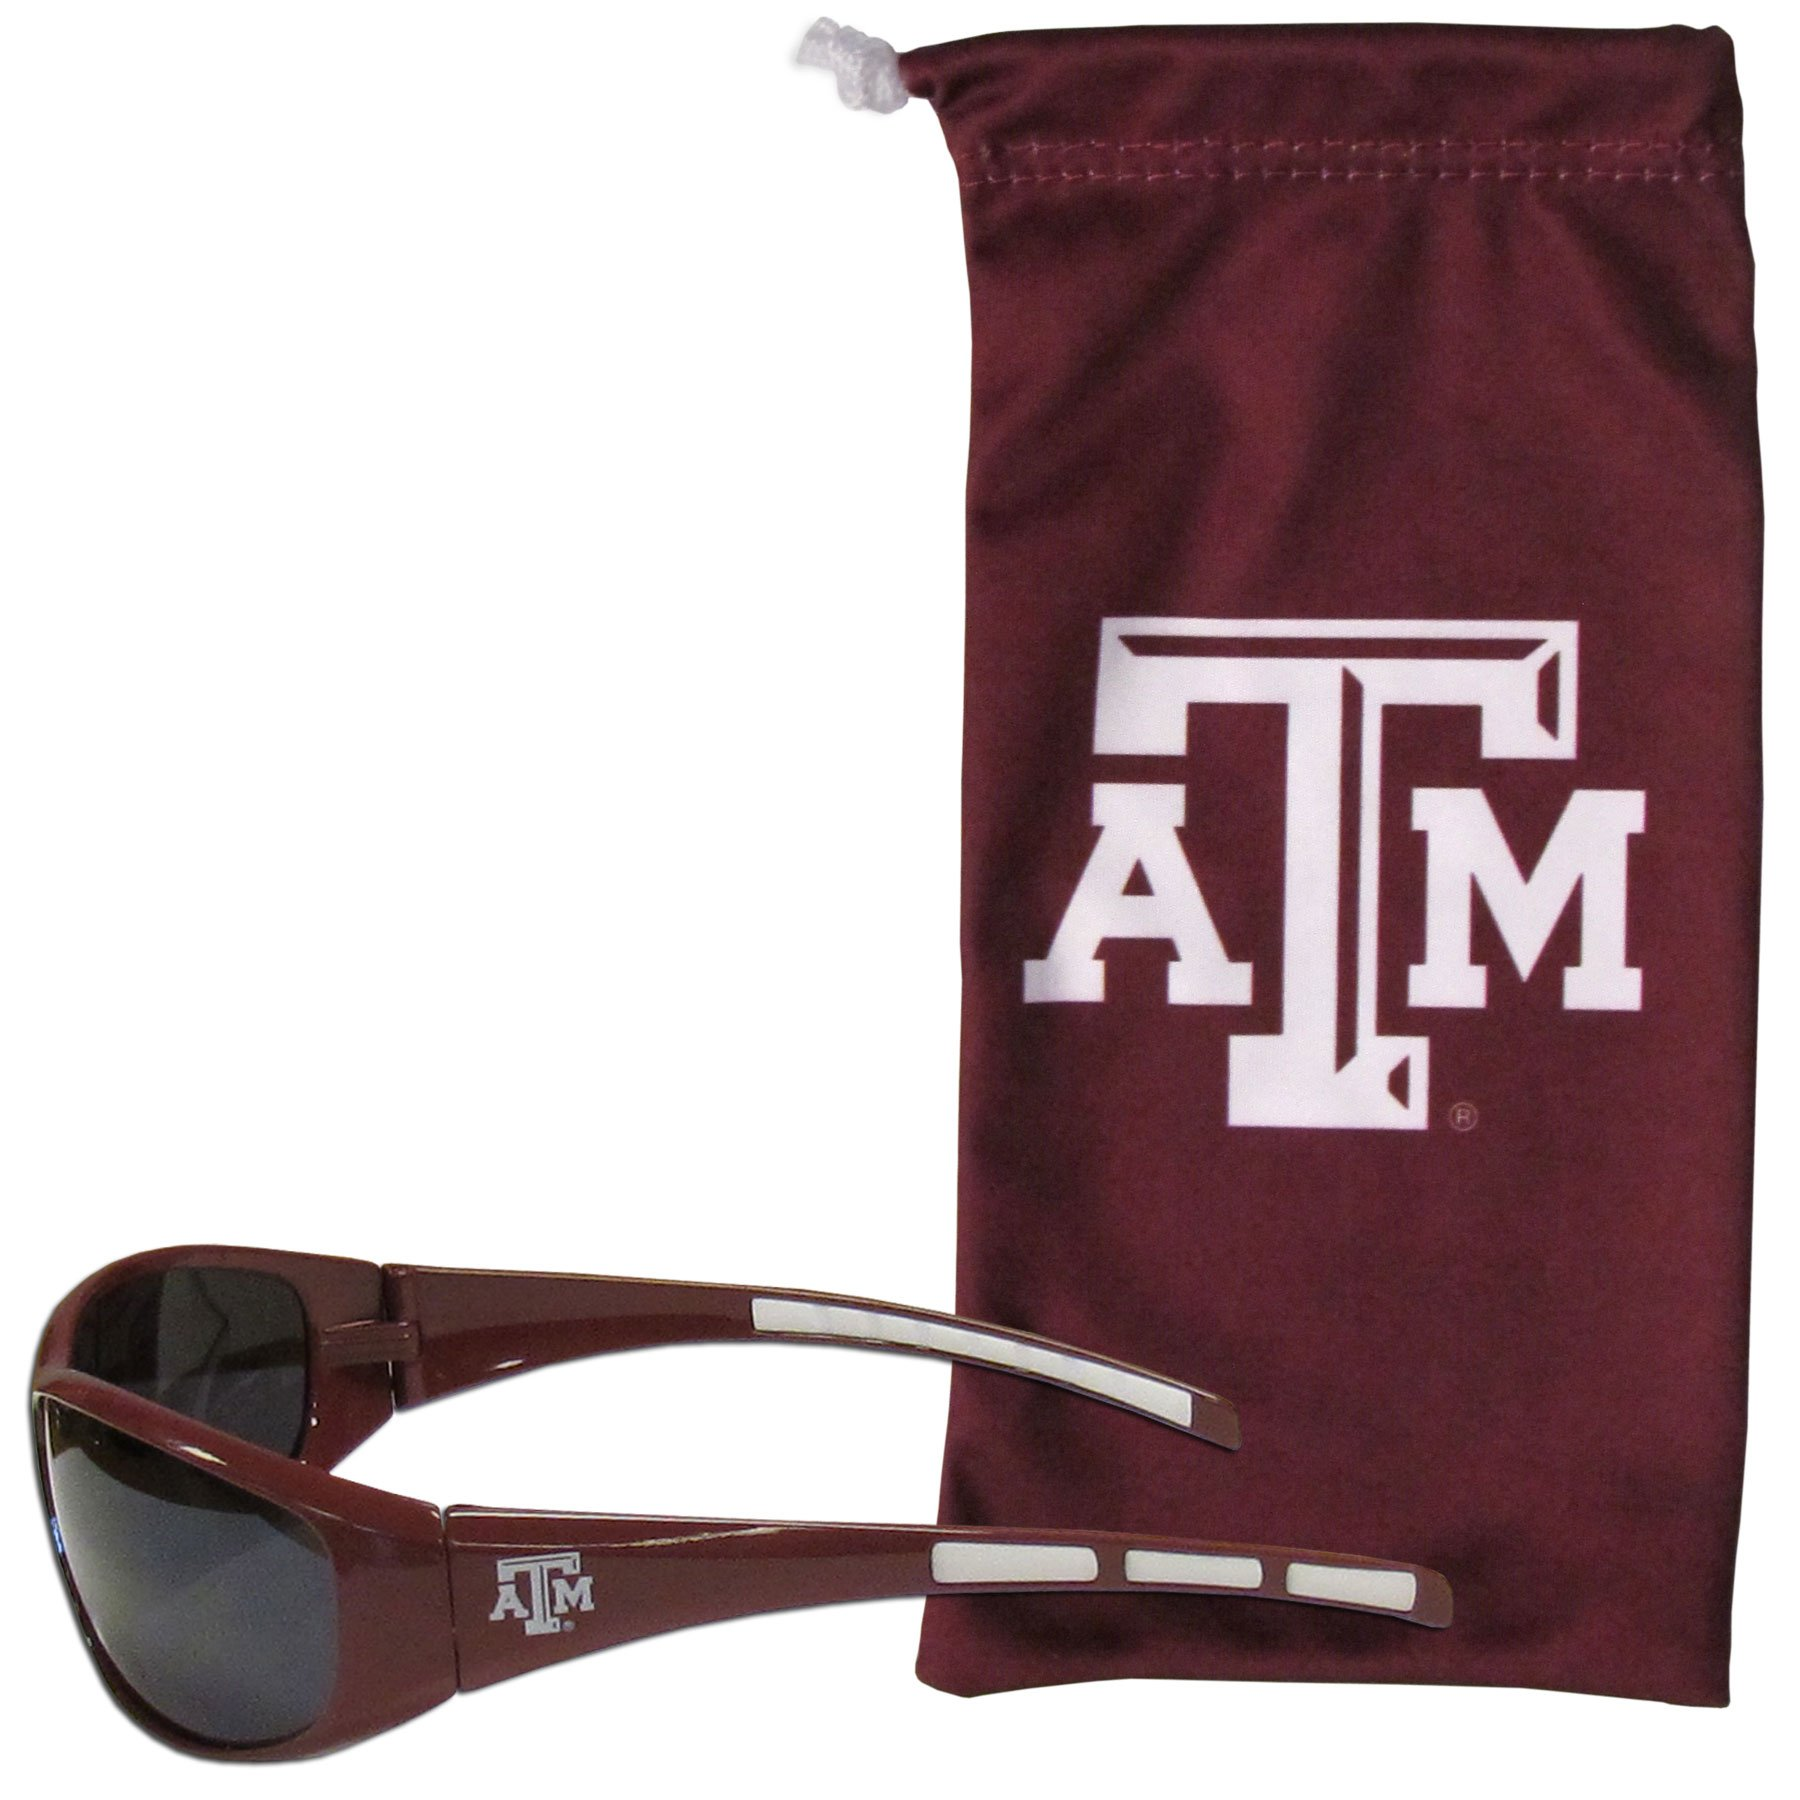 Siskiyou NCAA Texas A&M Aggies Adult Sunglass and Bag Set, Red